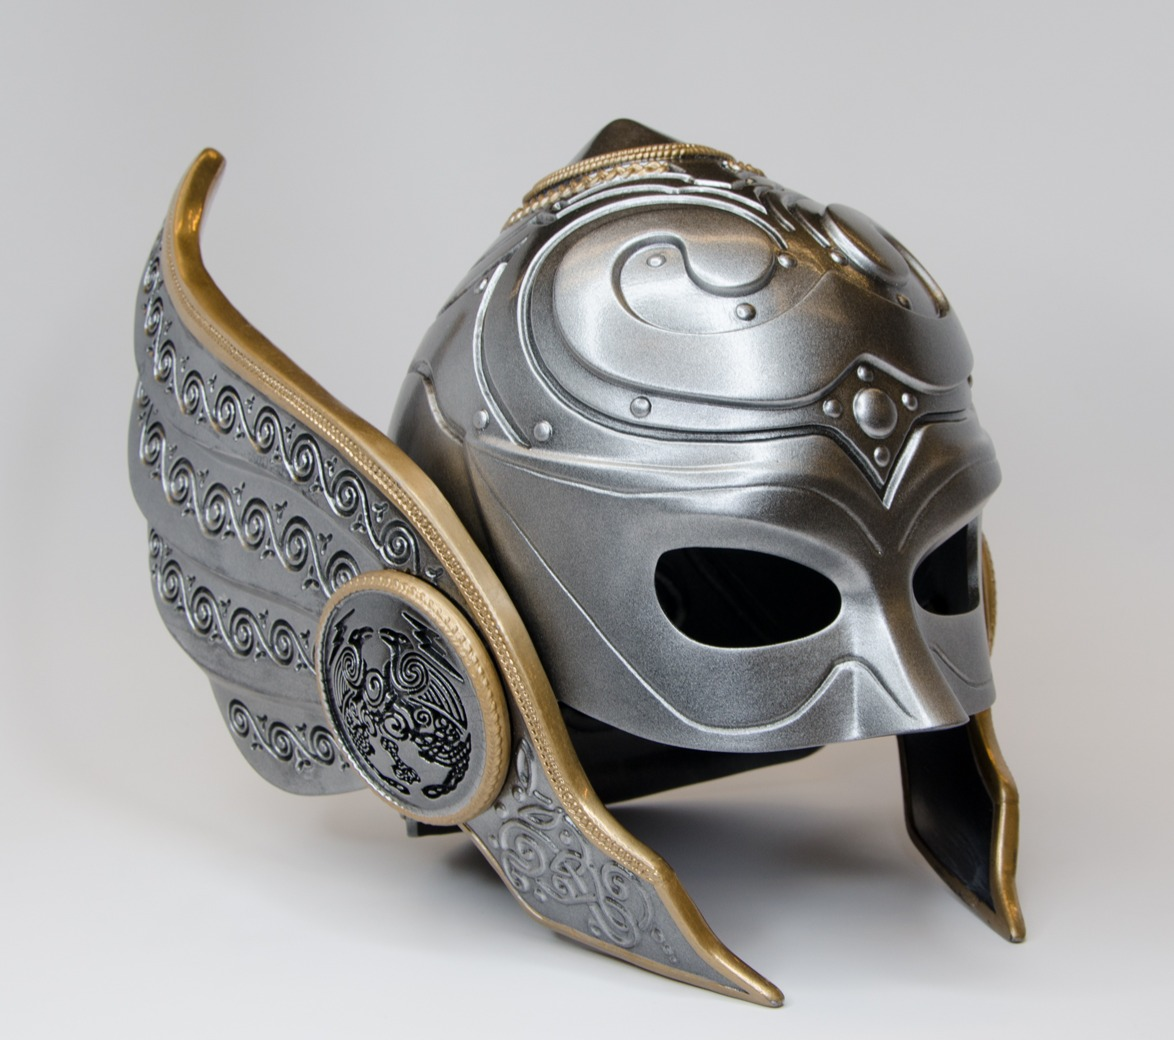 Jane Foster's Thor Helmet